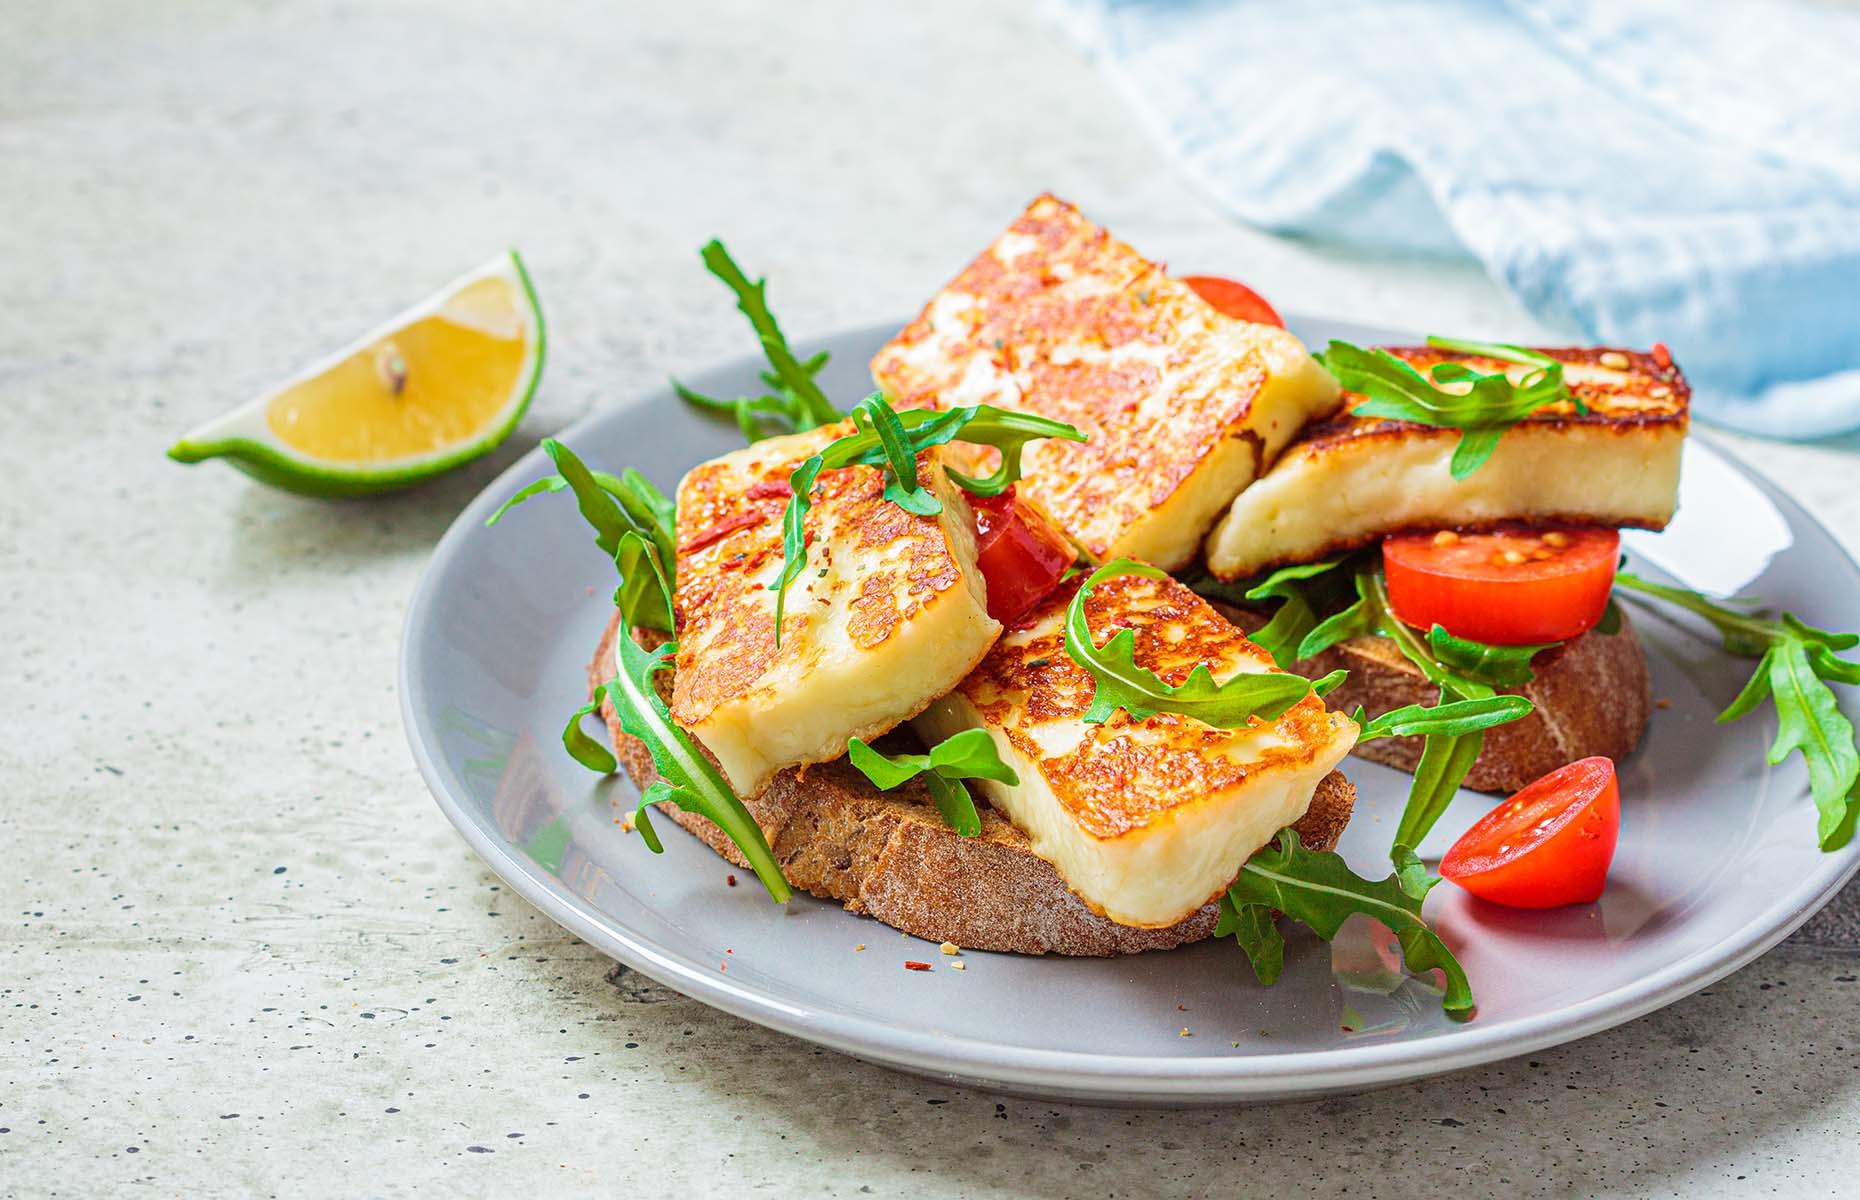 Freshly fried halloumi (Image: Nina Firsova/Shutterstock)